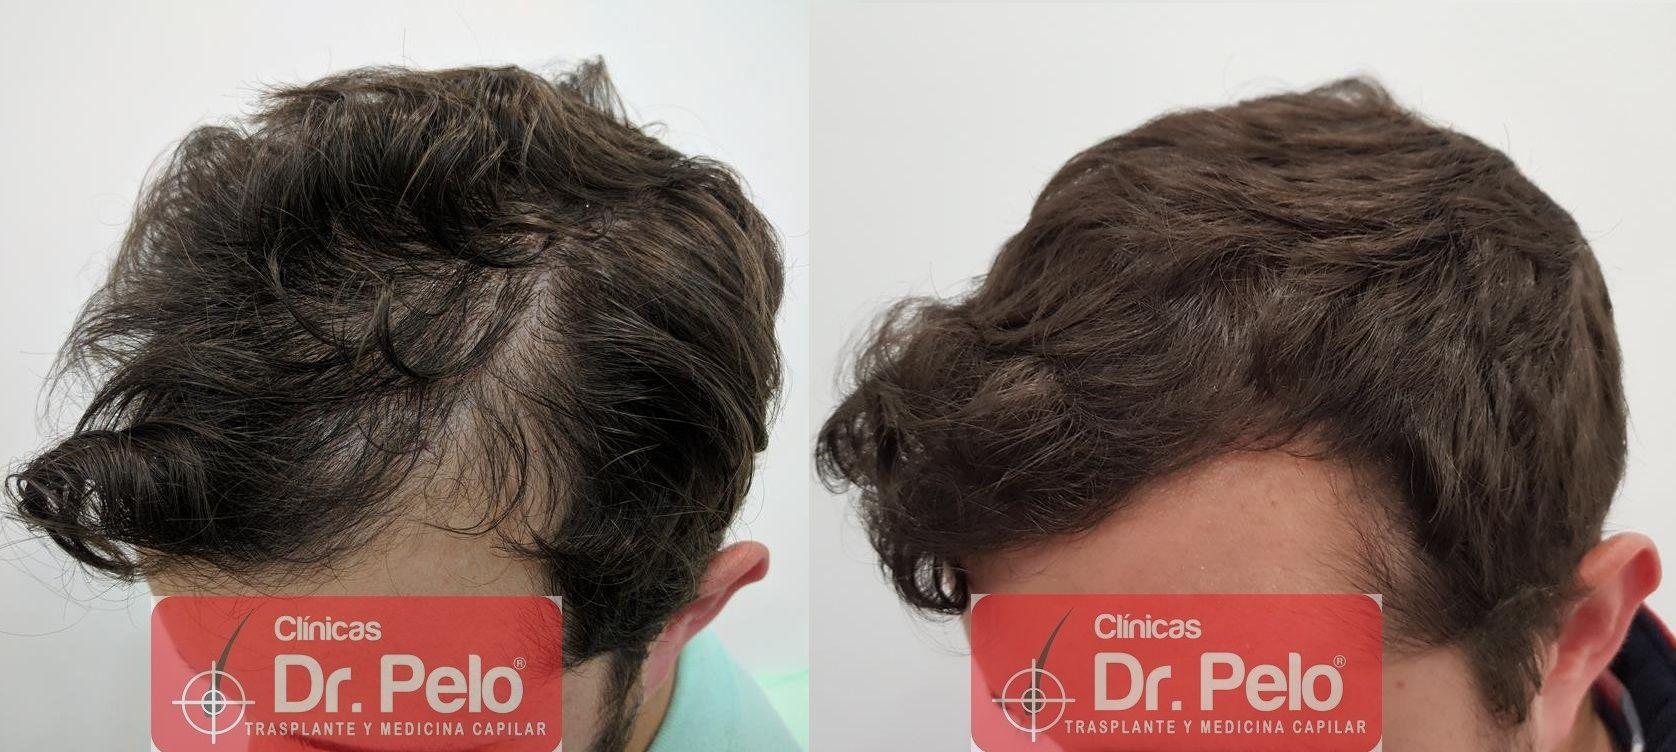 [Imagen: tratamiento-capilar-en-dr-pelo-41.jpg]